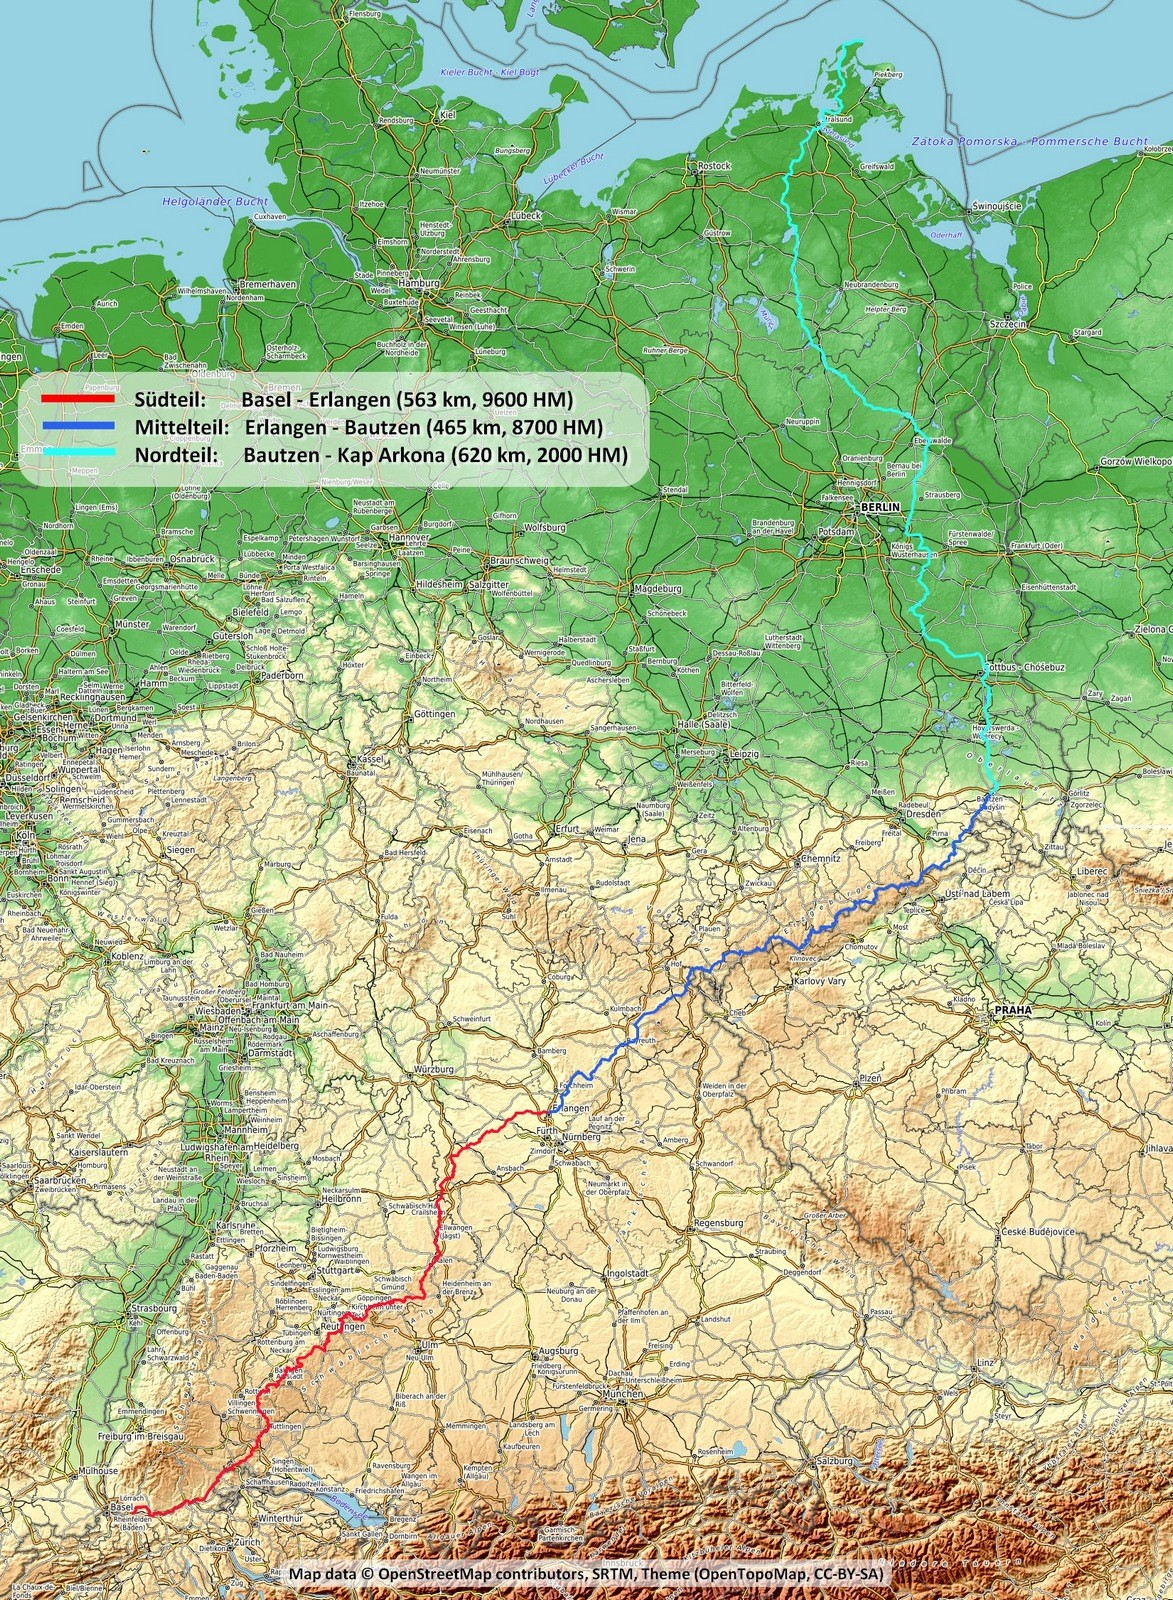 BTG2021 route https://blog.maiwolf.de/transgermany/